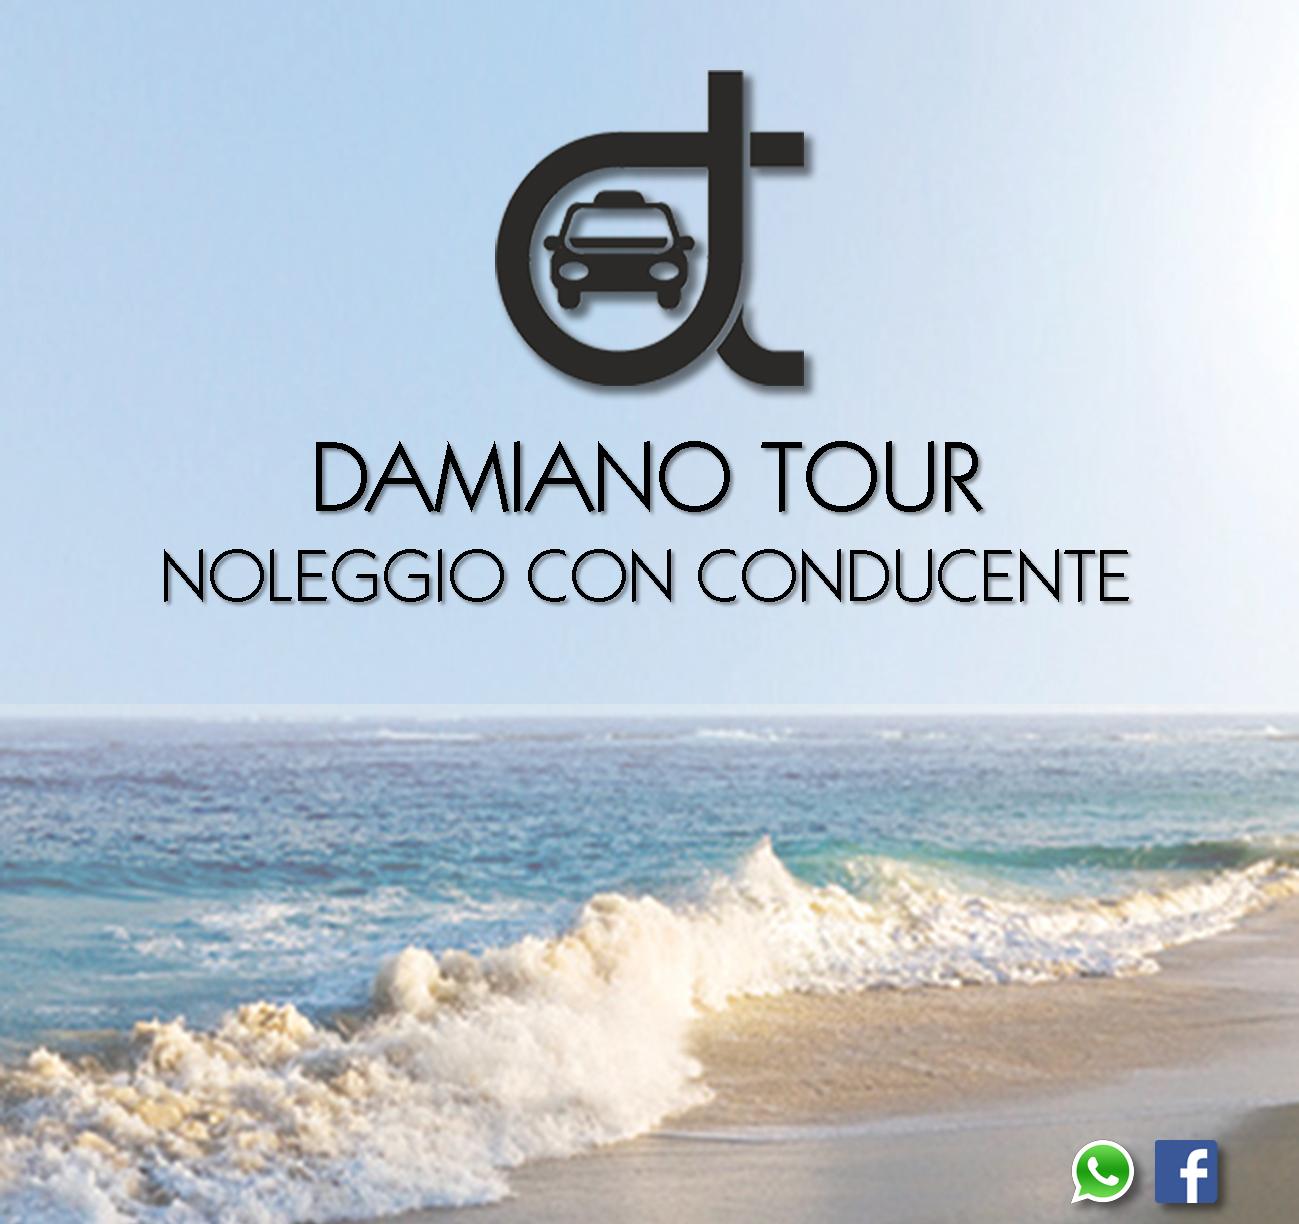 NCC Damiano Tour noleggio con conducente